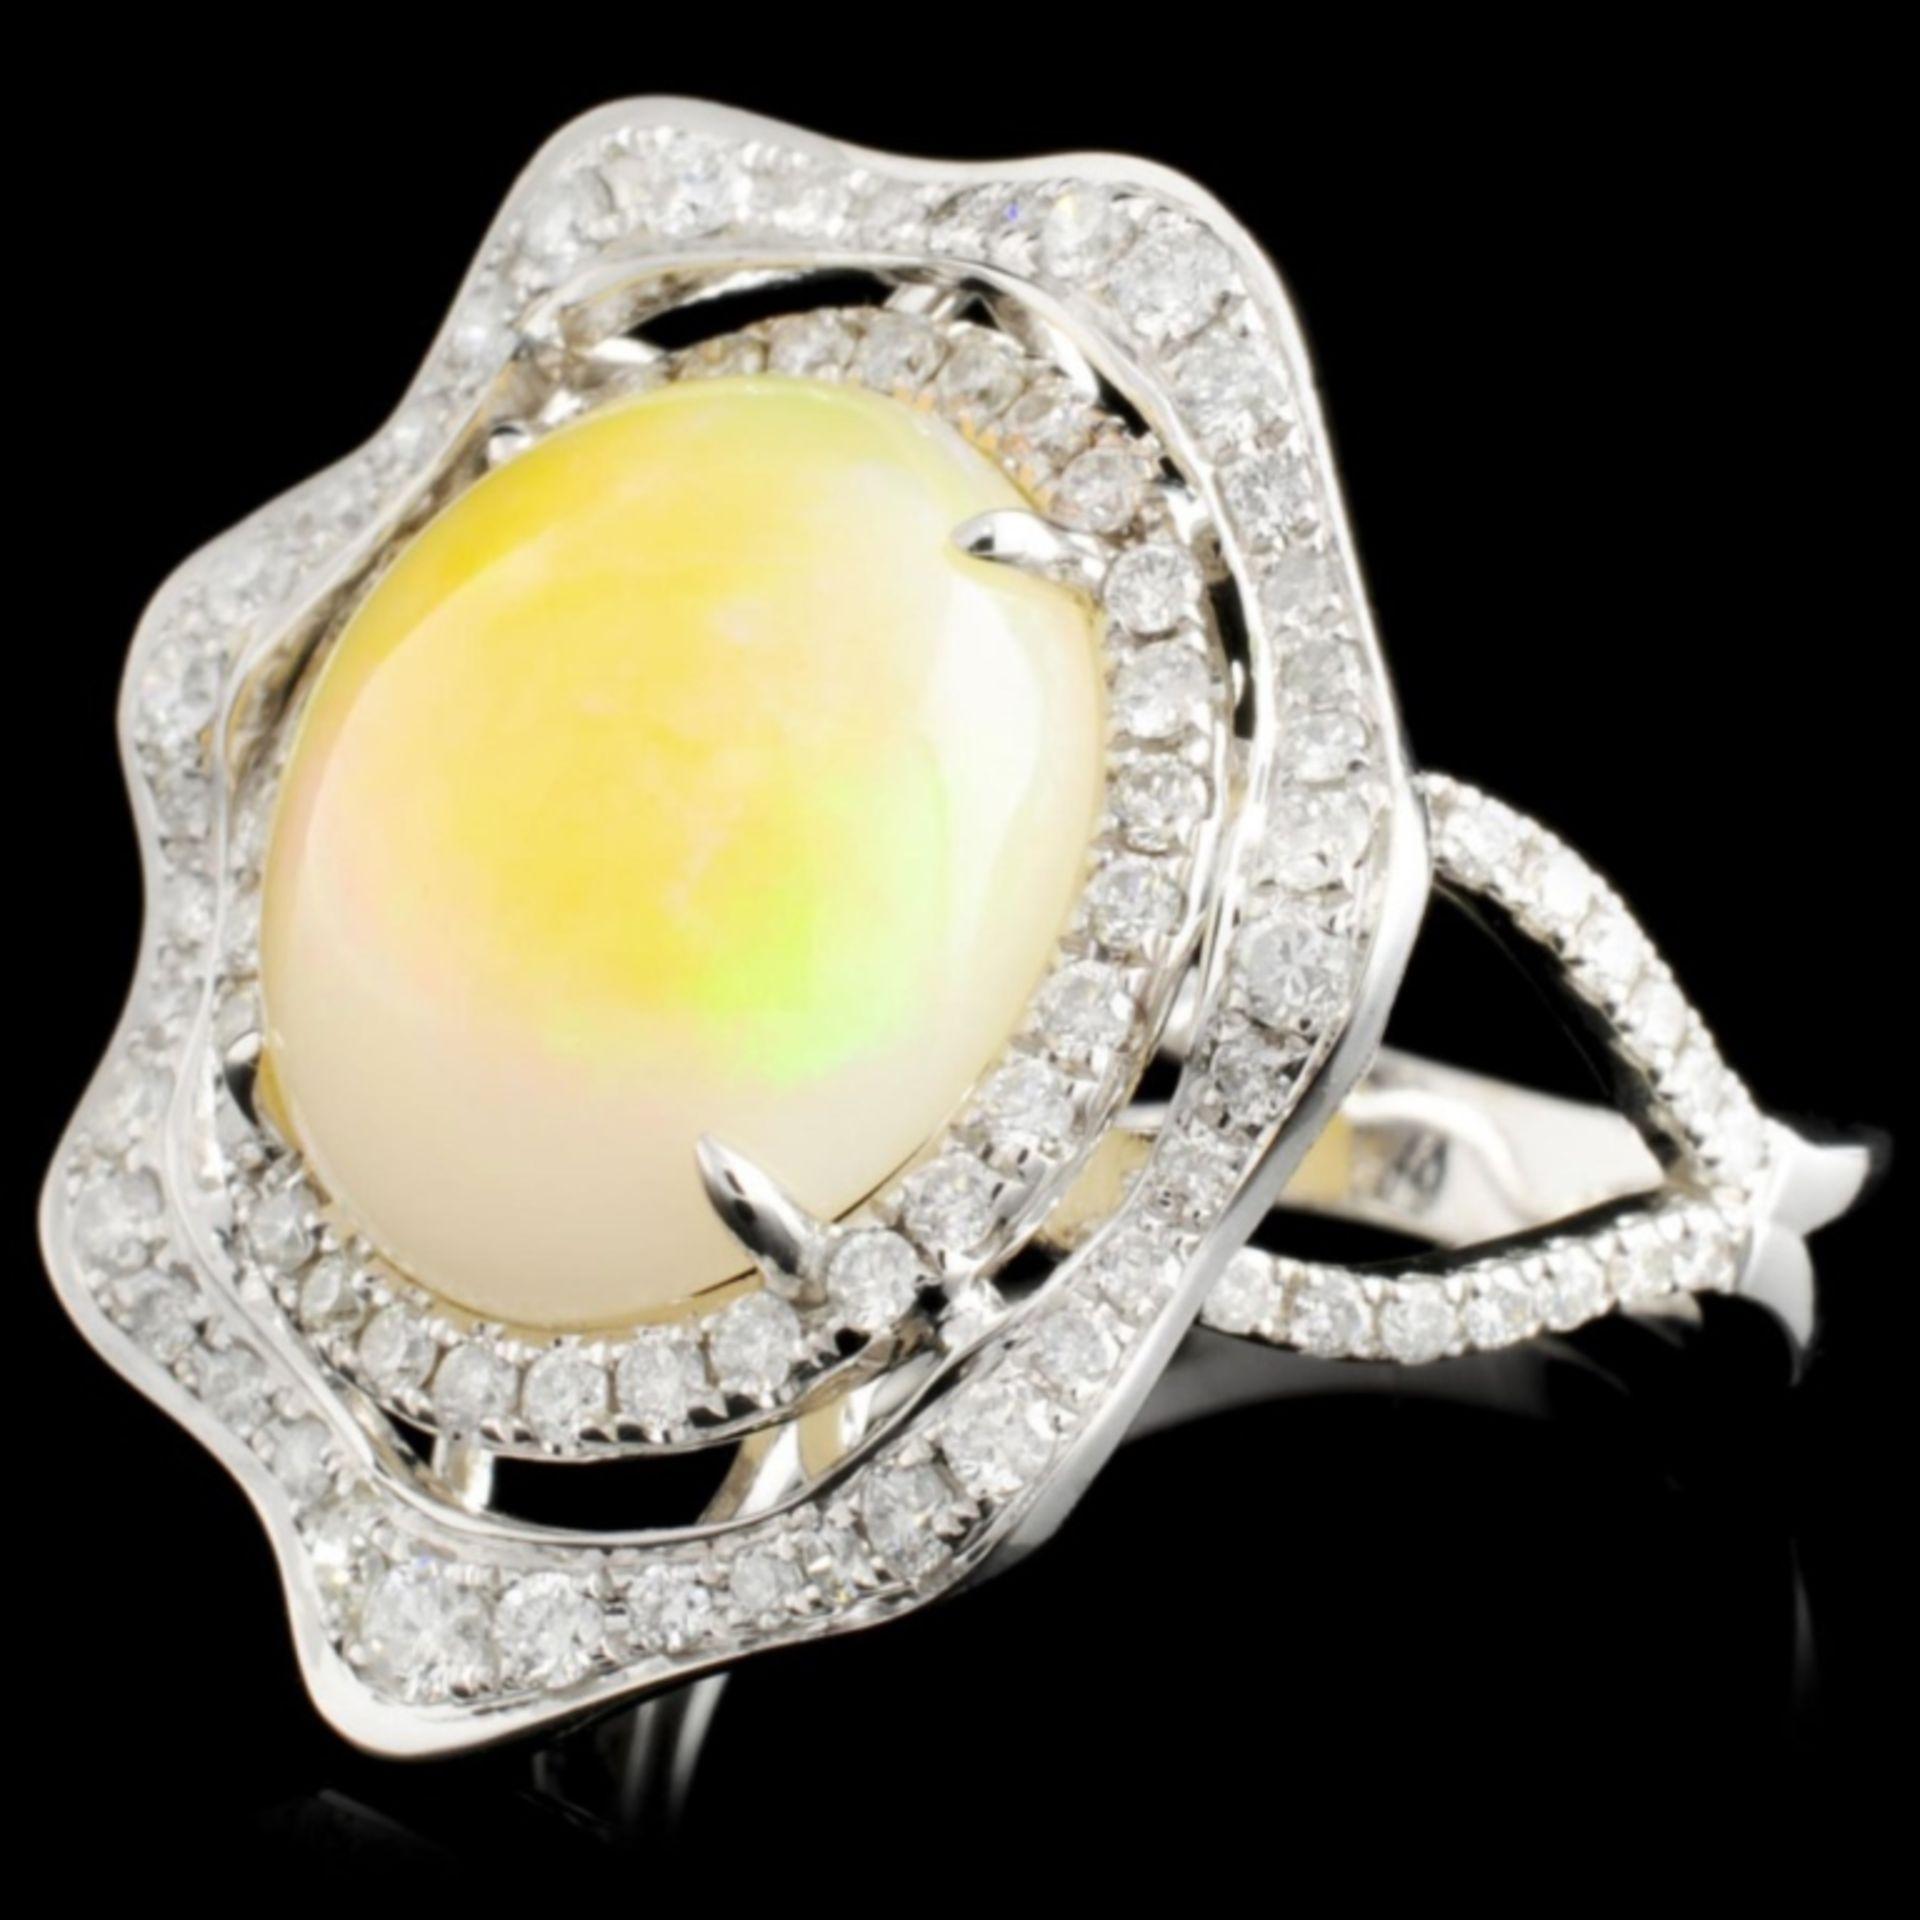 14K Gold 5.27ct Opal & 0.90ctw Diamond Ring - Image 2 of 4